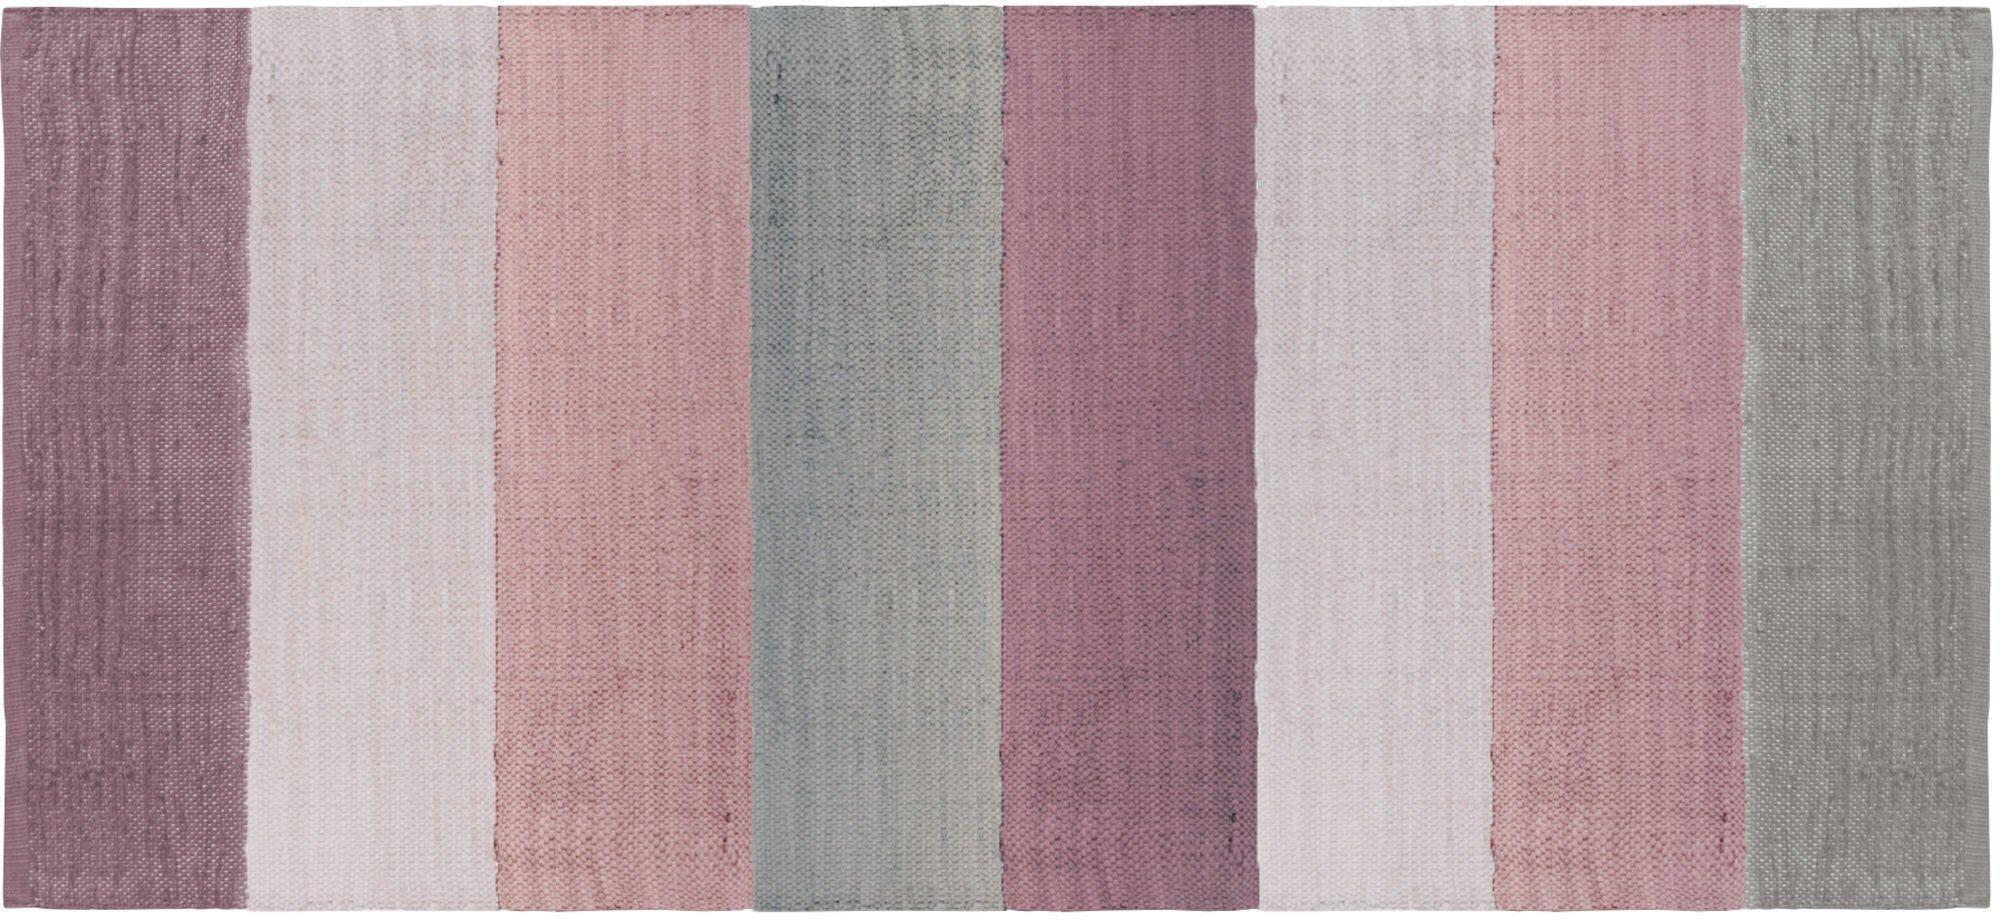 Sebra Gulvteppe 80x180, Rosa